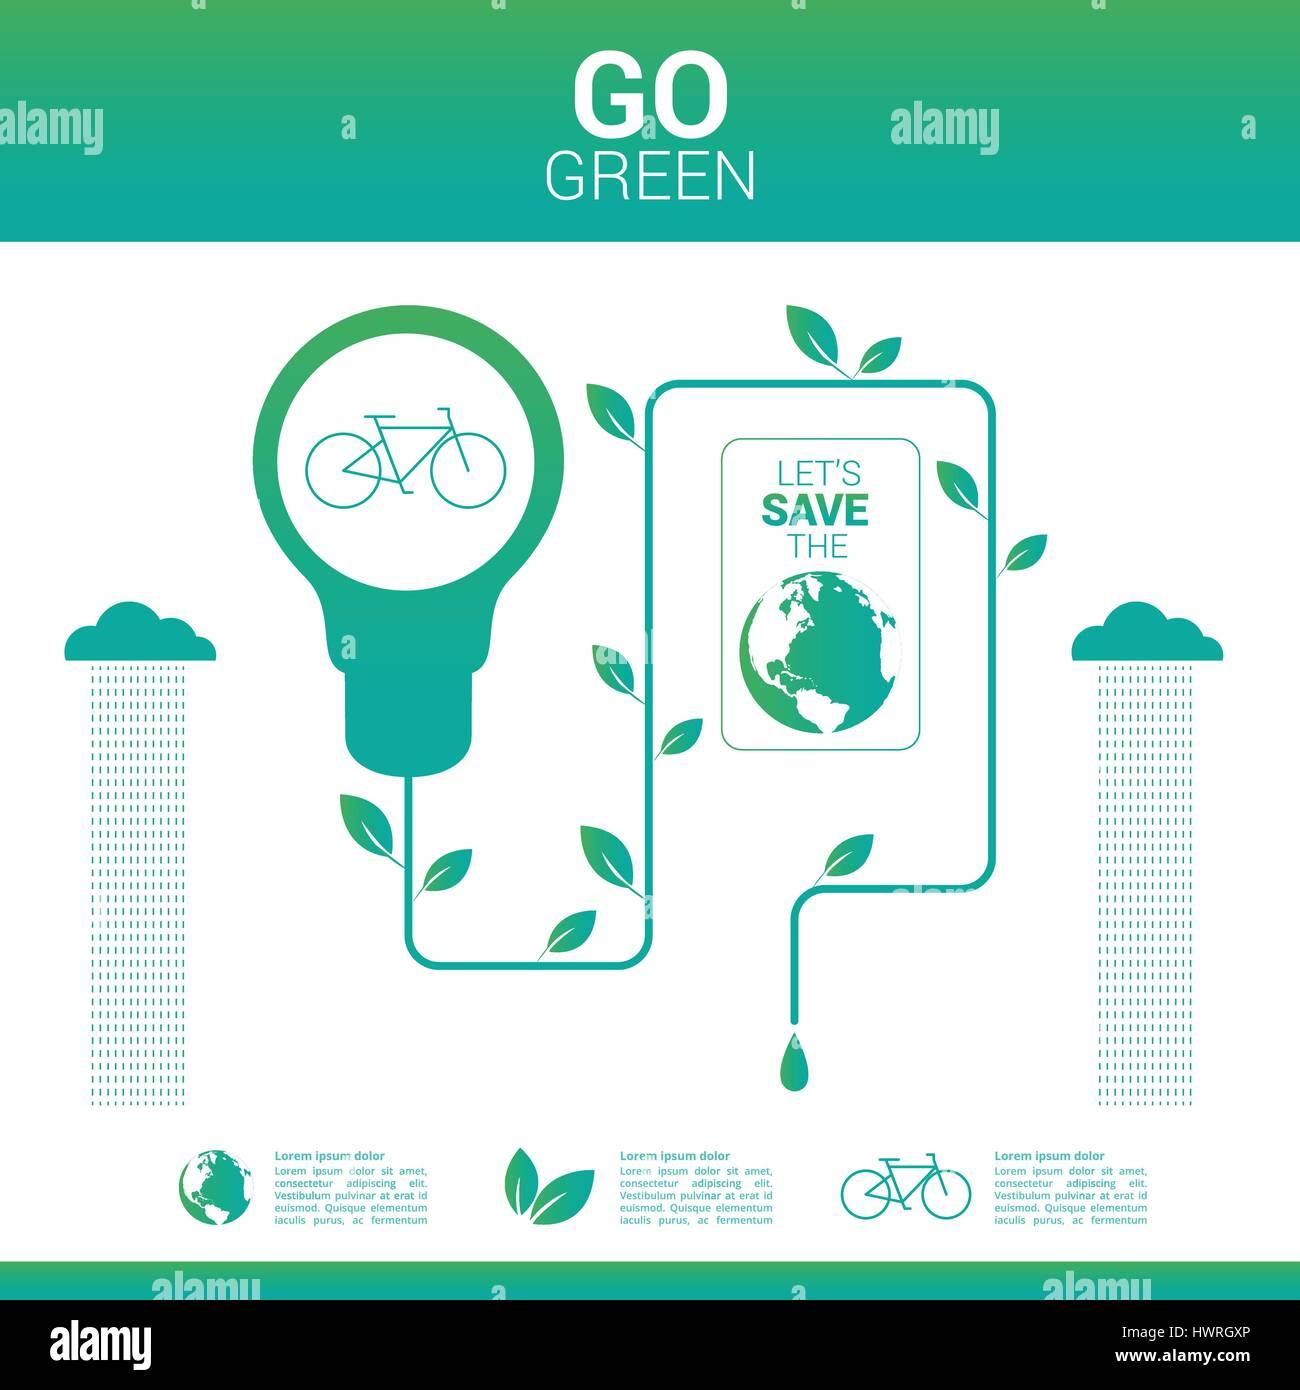 Go green environmentally friendly world - Stock Image